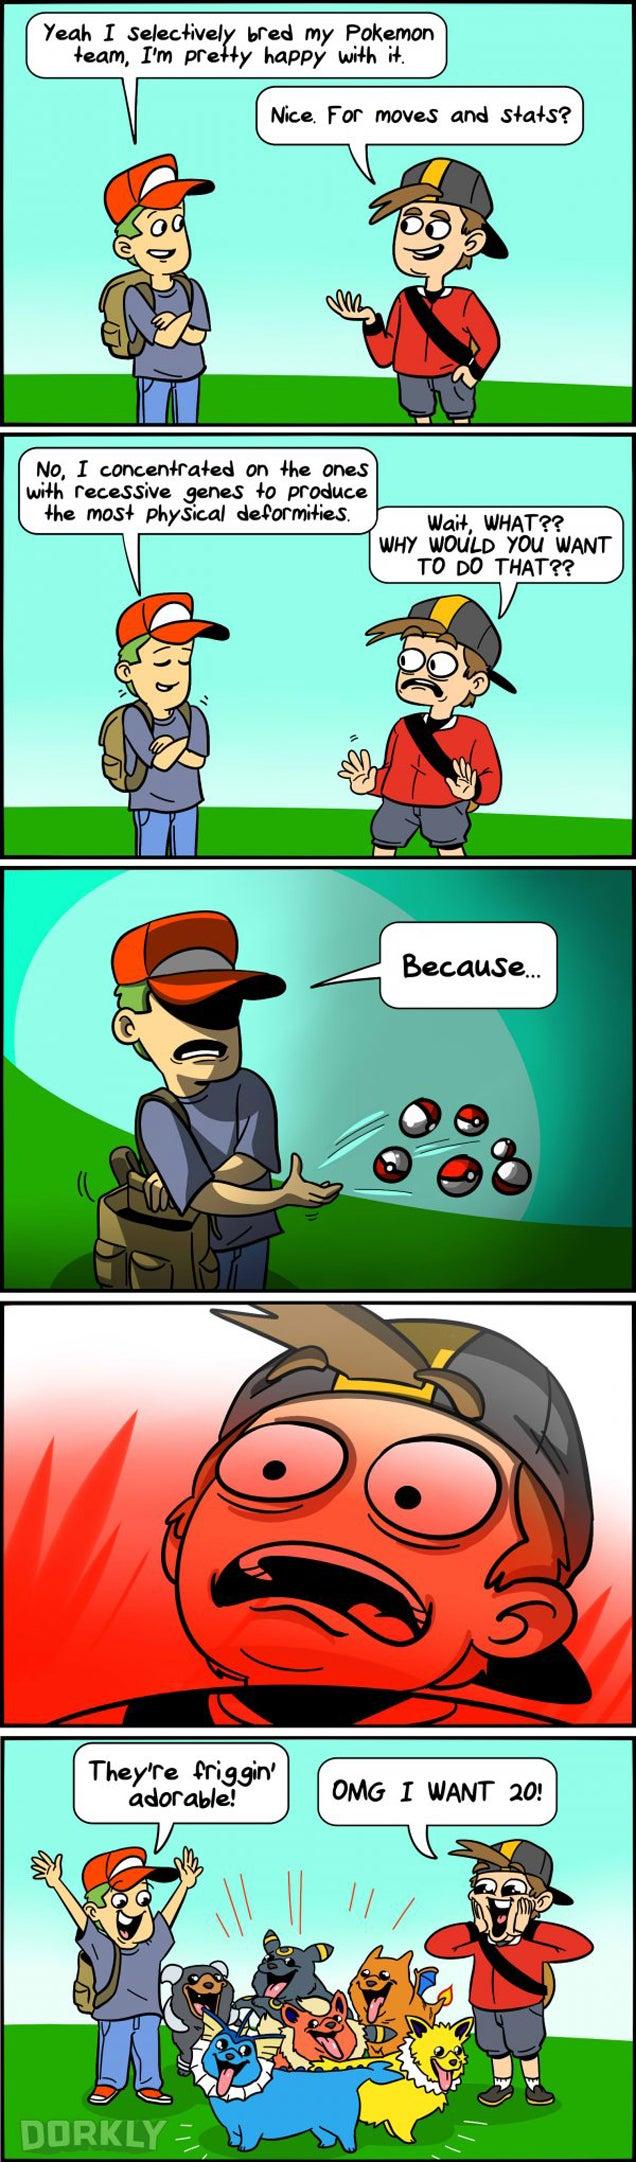 The Surprising Results of Selective Pokémon Breeding